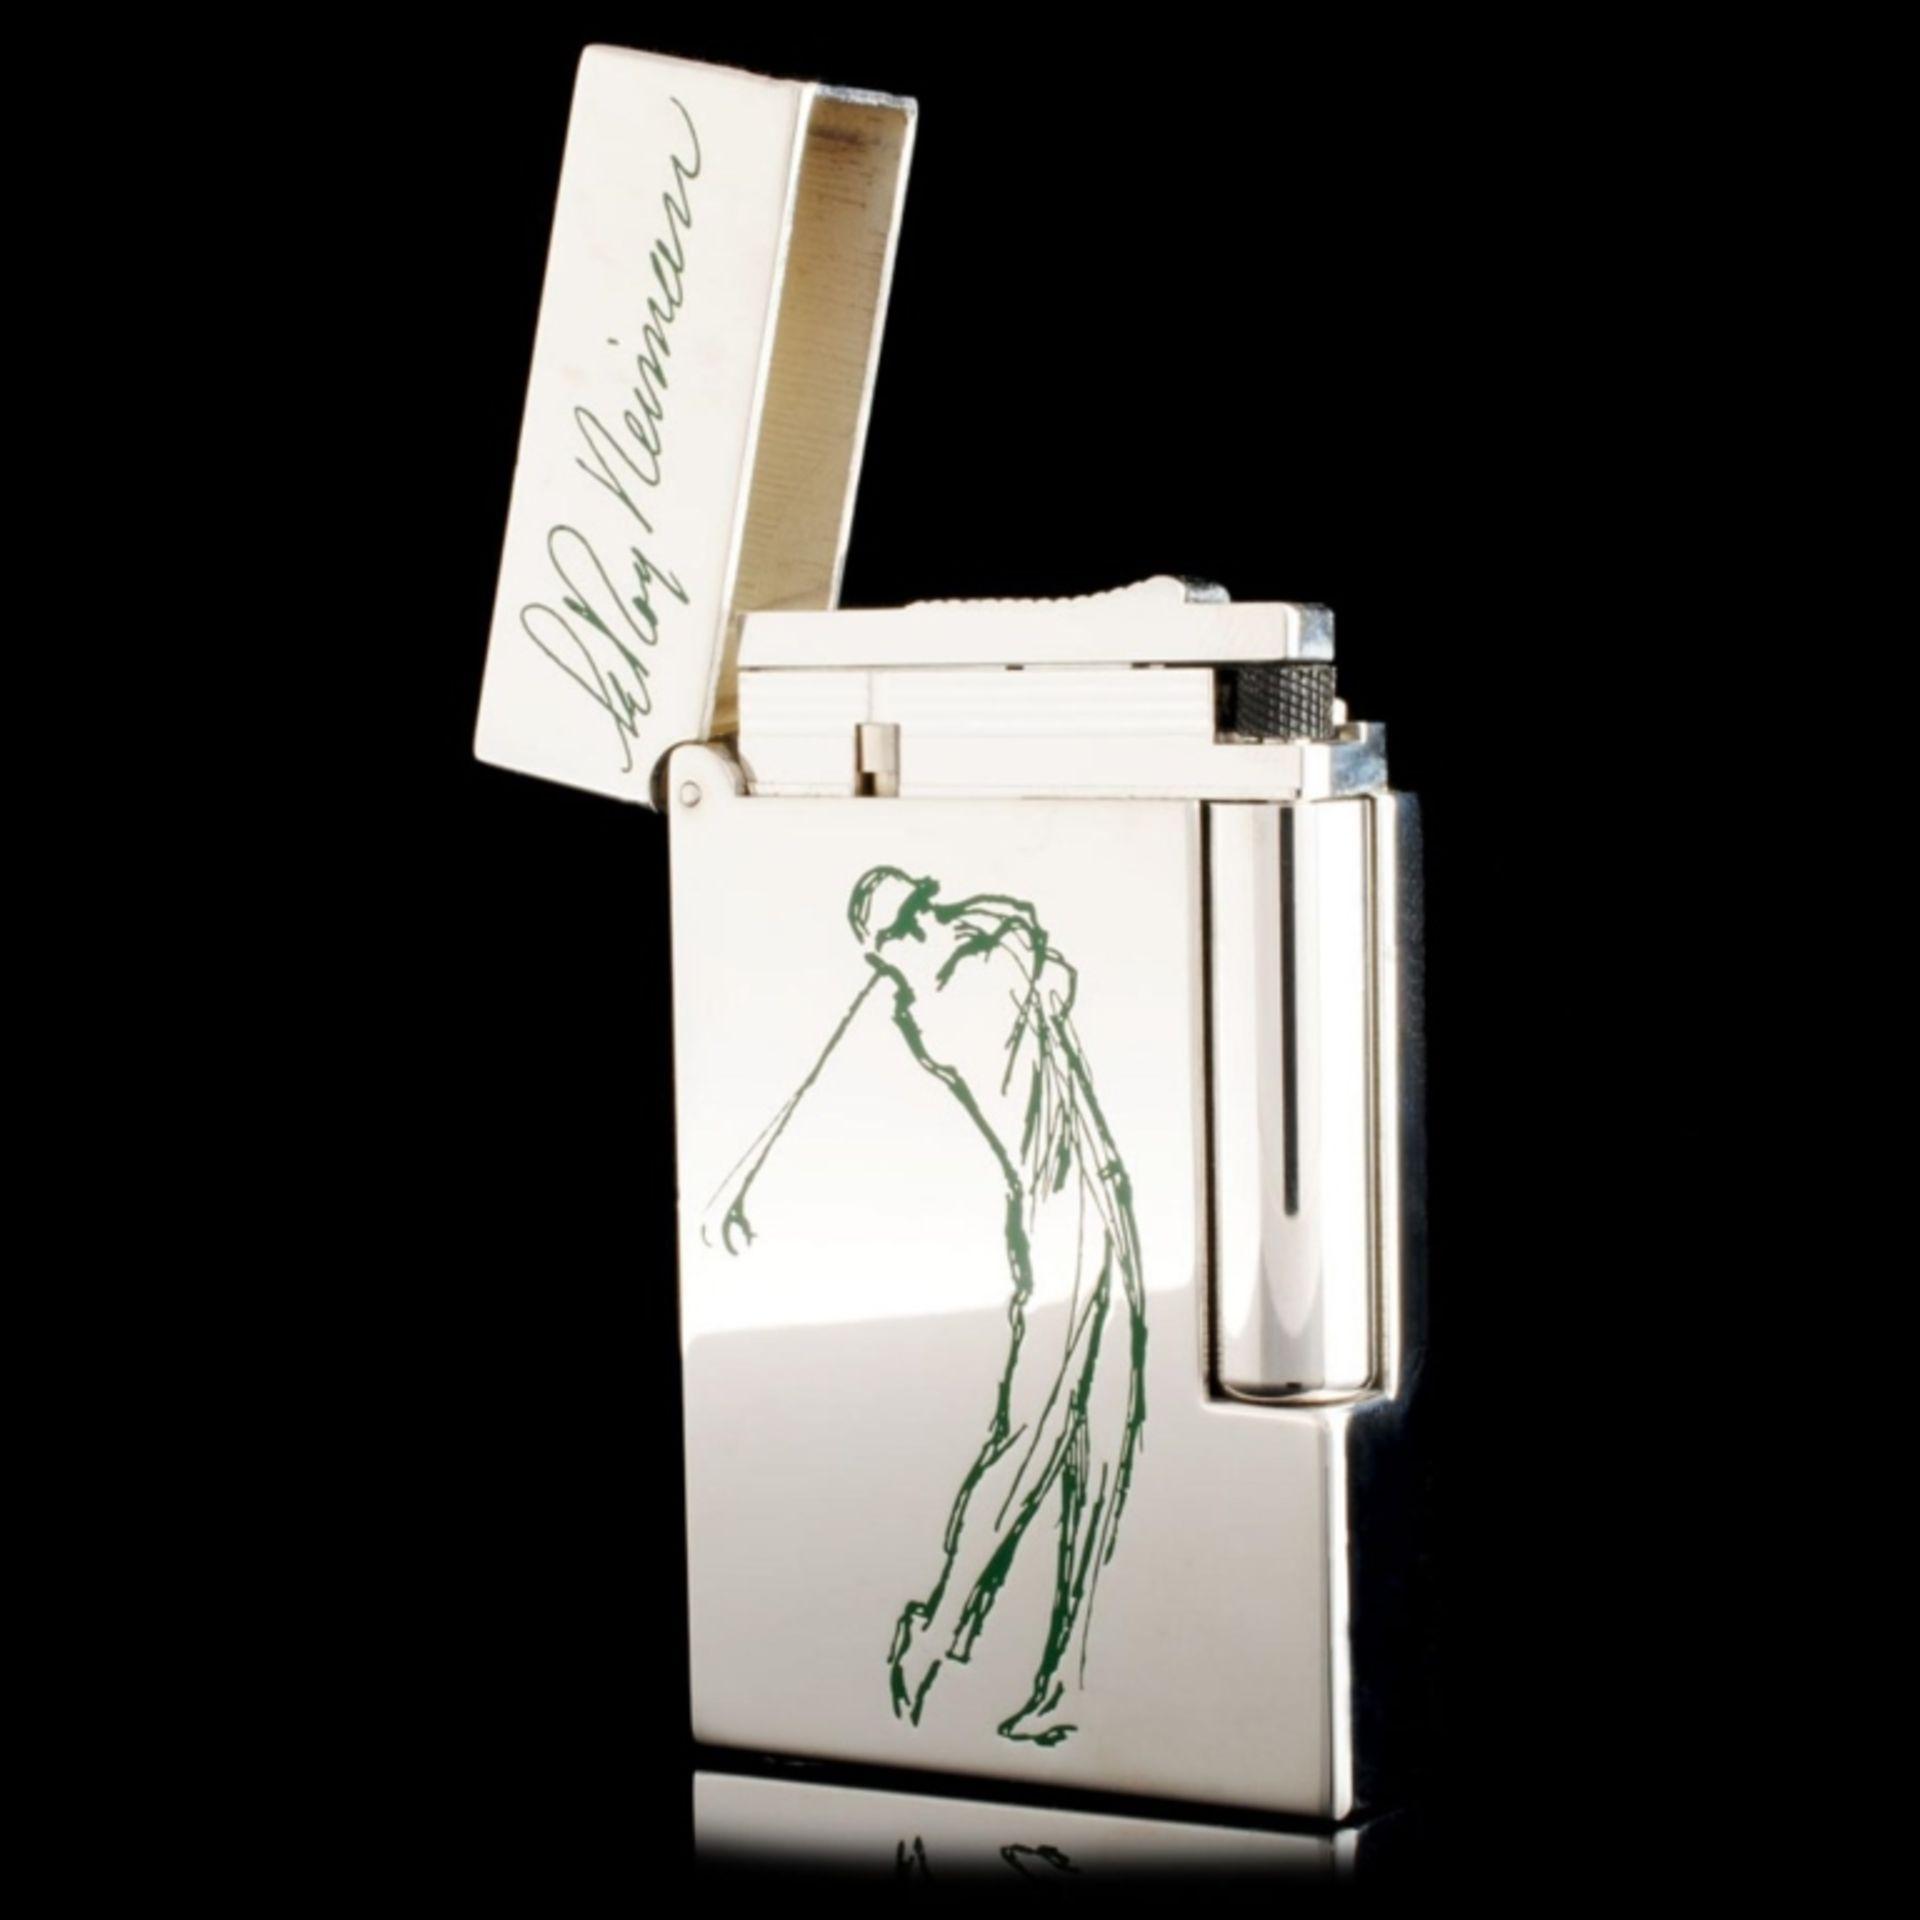 ST Dupont Leroy Nieman Lighter